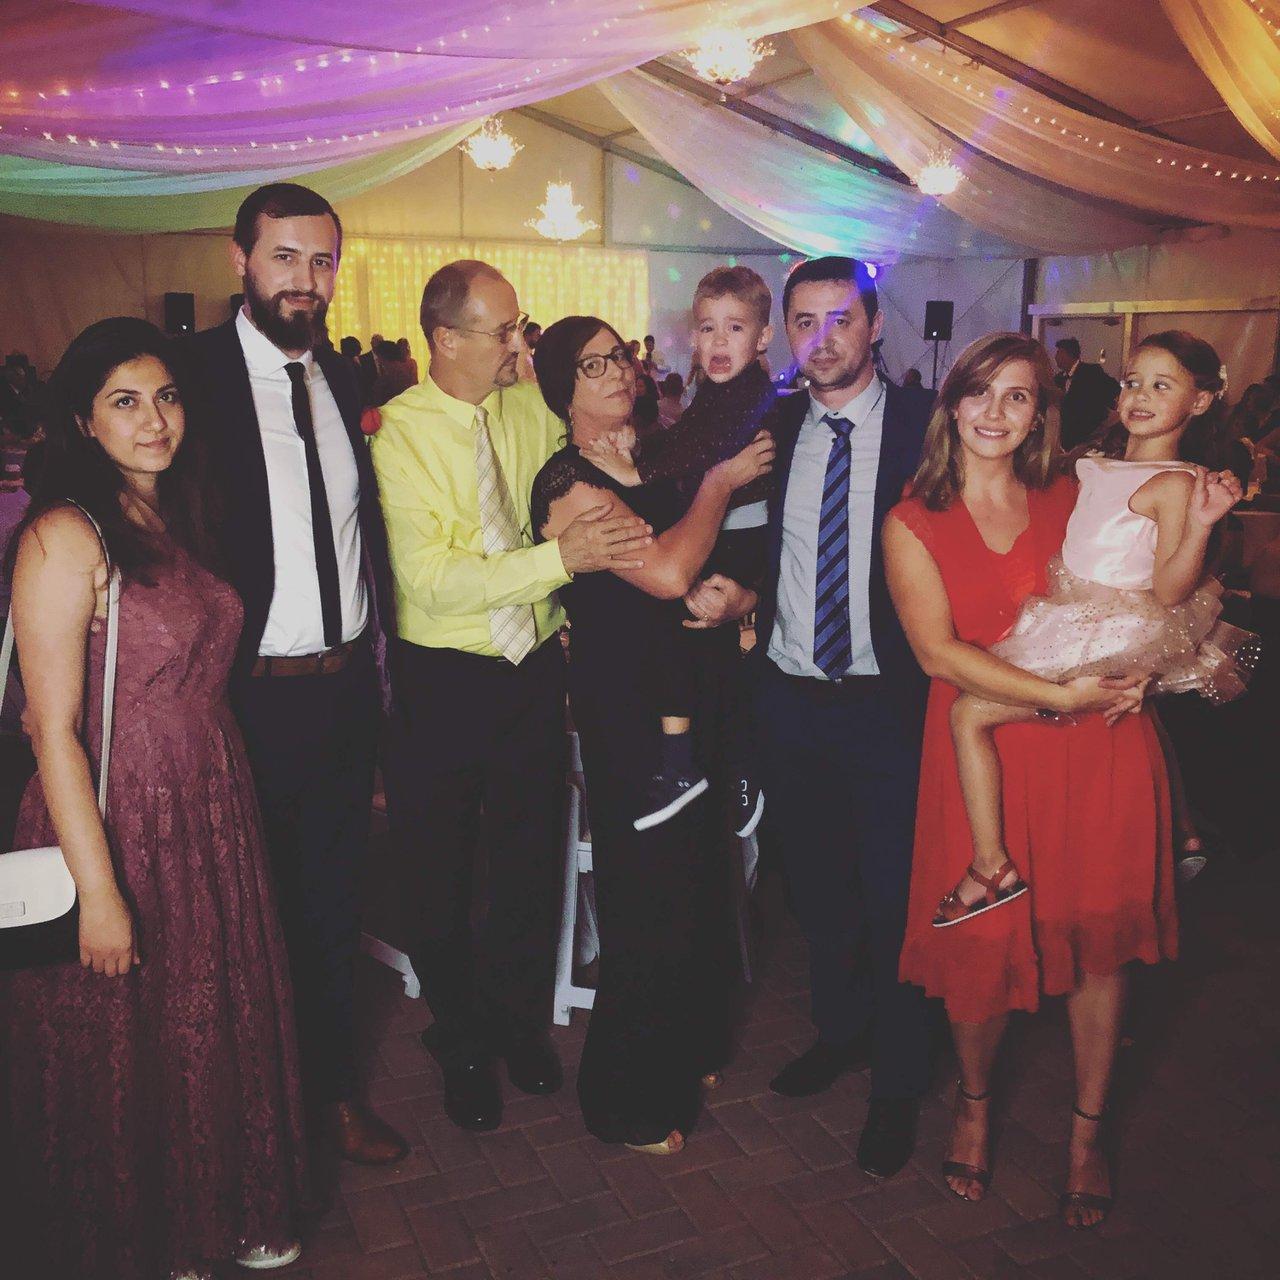 Leyjla and John Wedding—#LCJB2019 photo 1104619C-5730-4DFA-AEC7-E46132C6025D.jpg